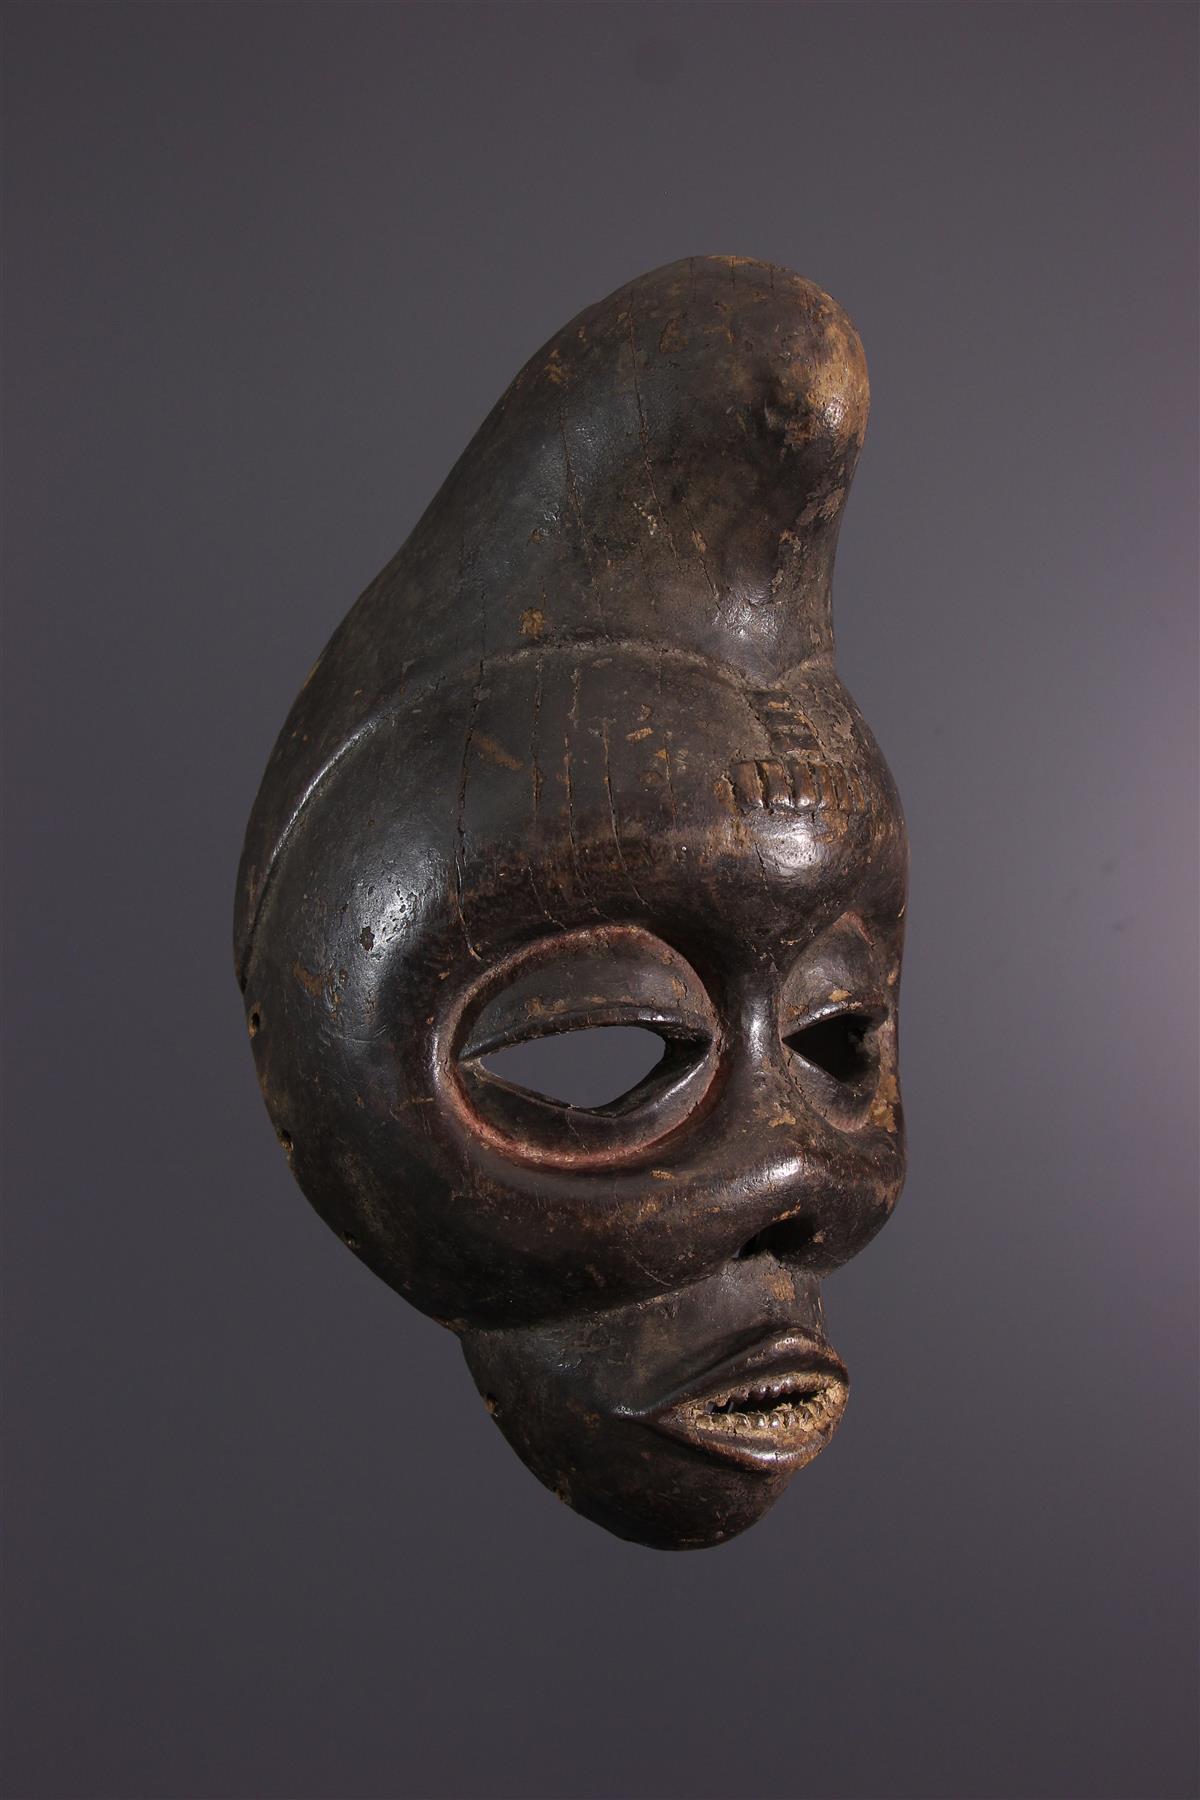 Ibibio mask - African art